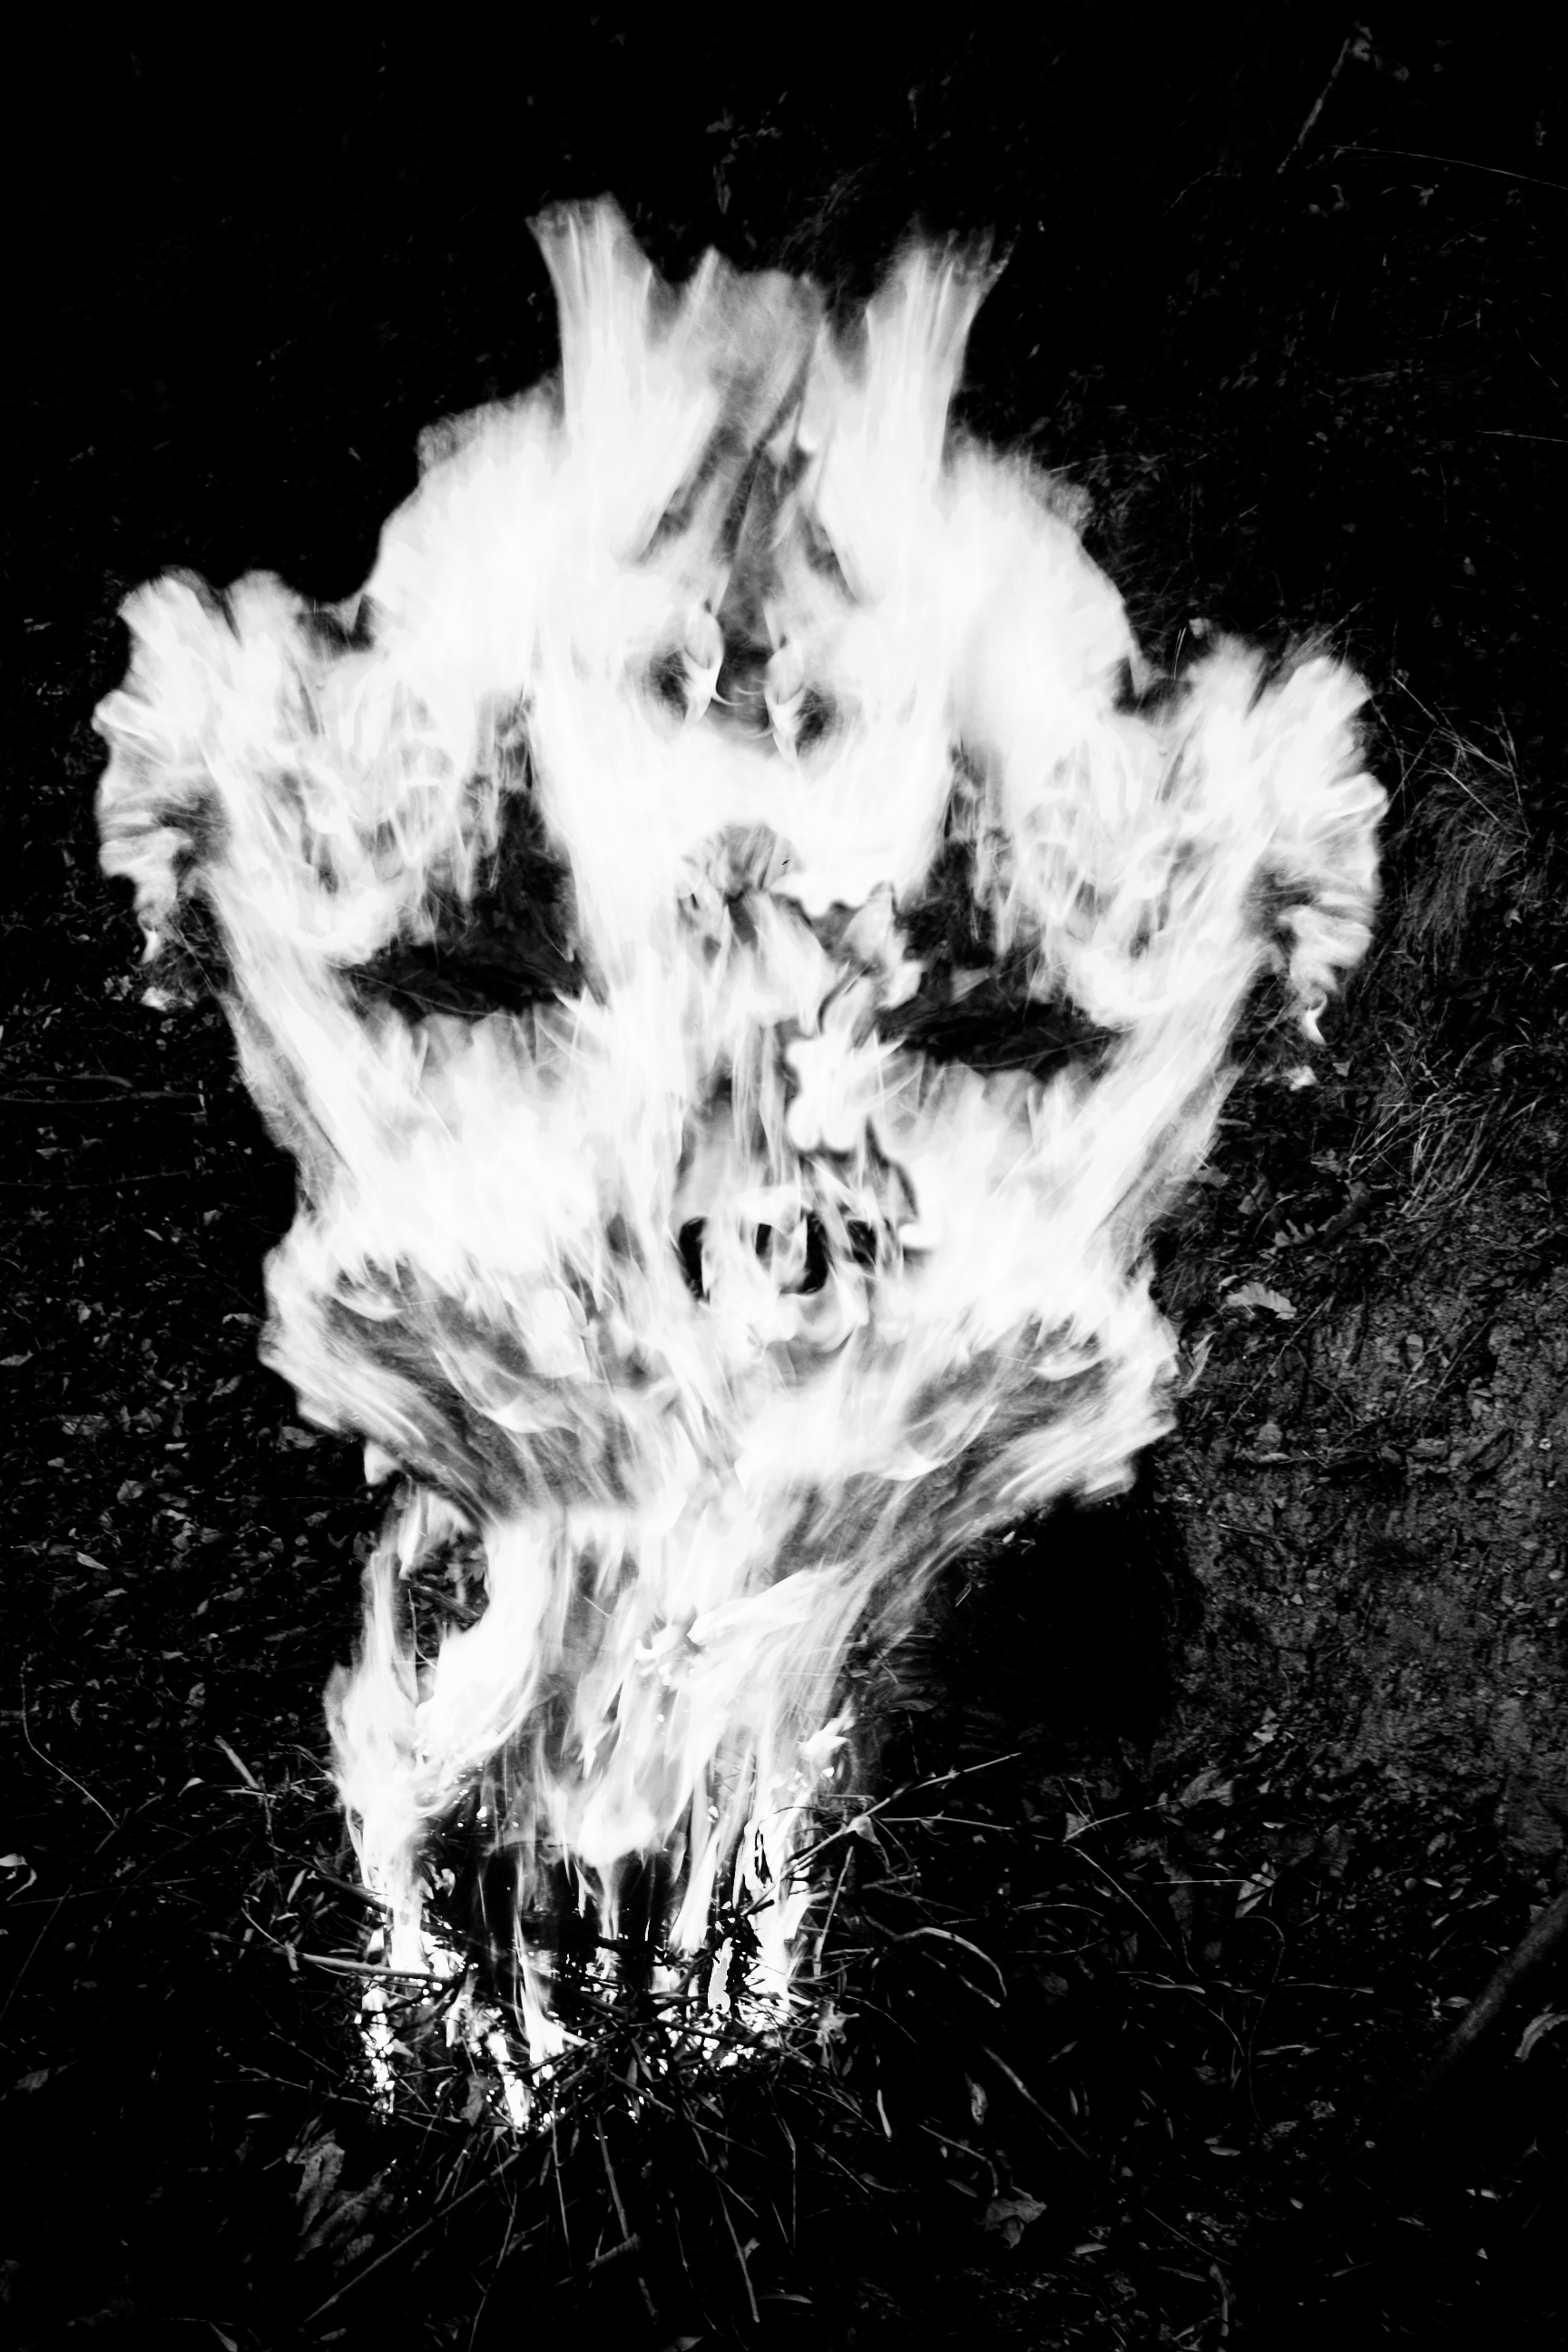 Skull on fire. Ph. Anna Laviosa 2013, tutti i diritti riservati